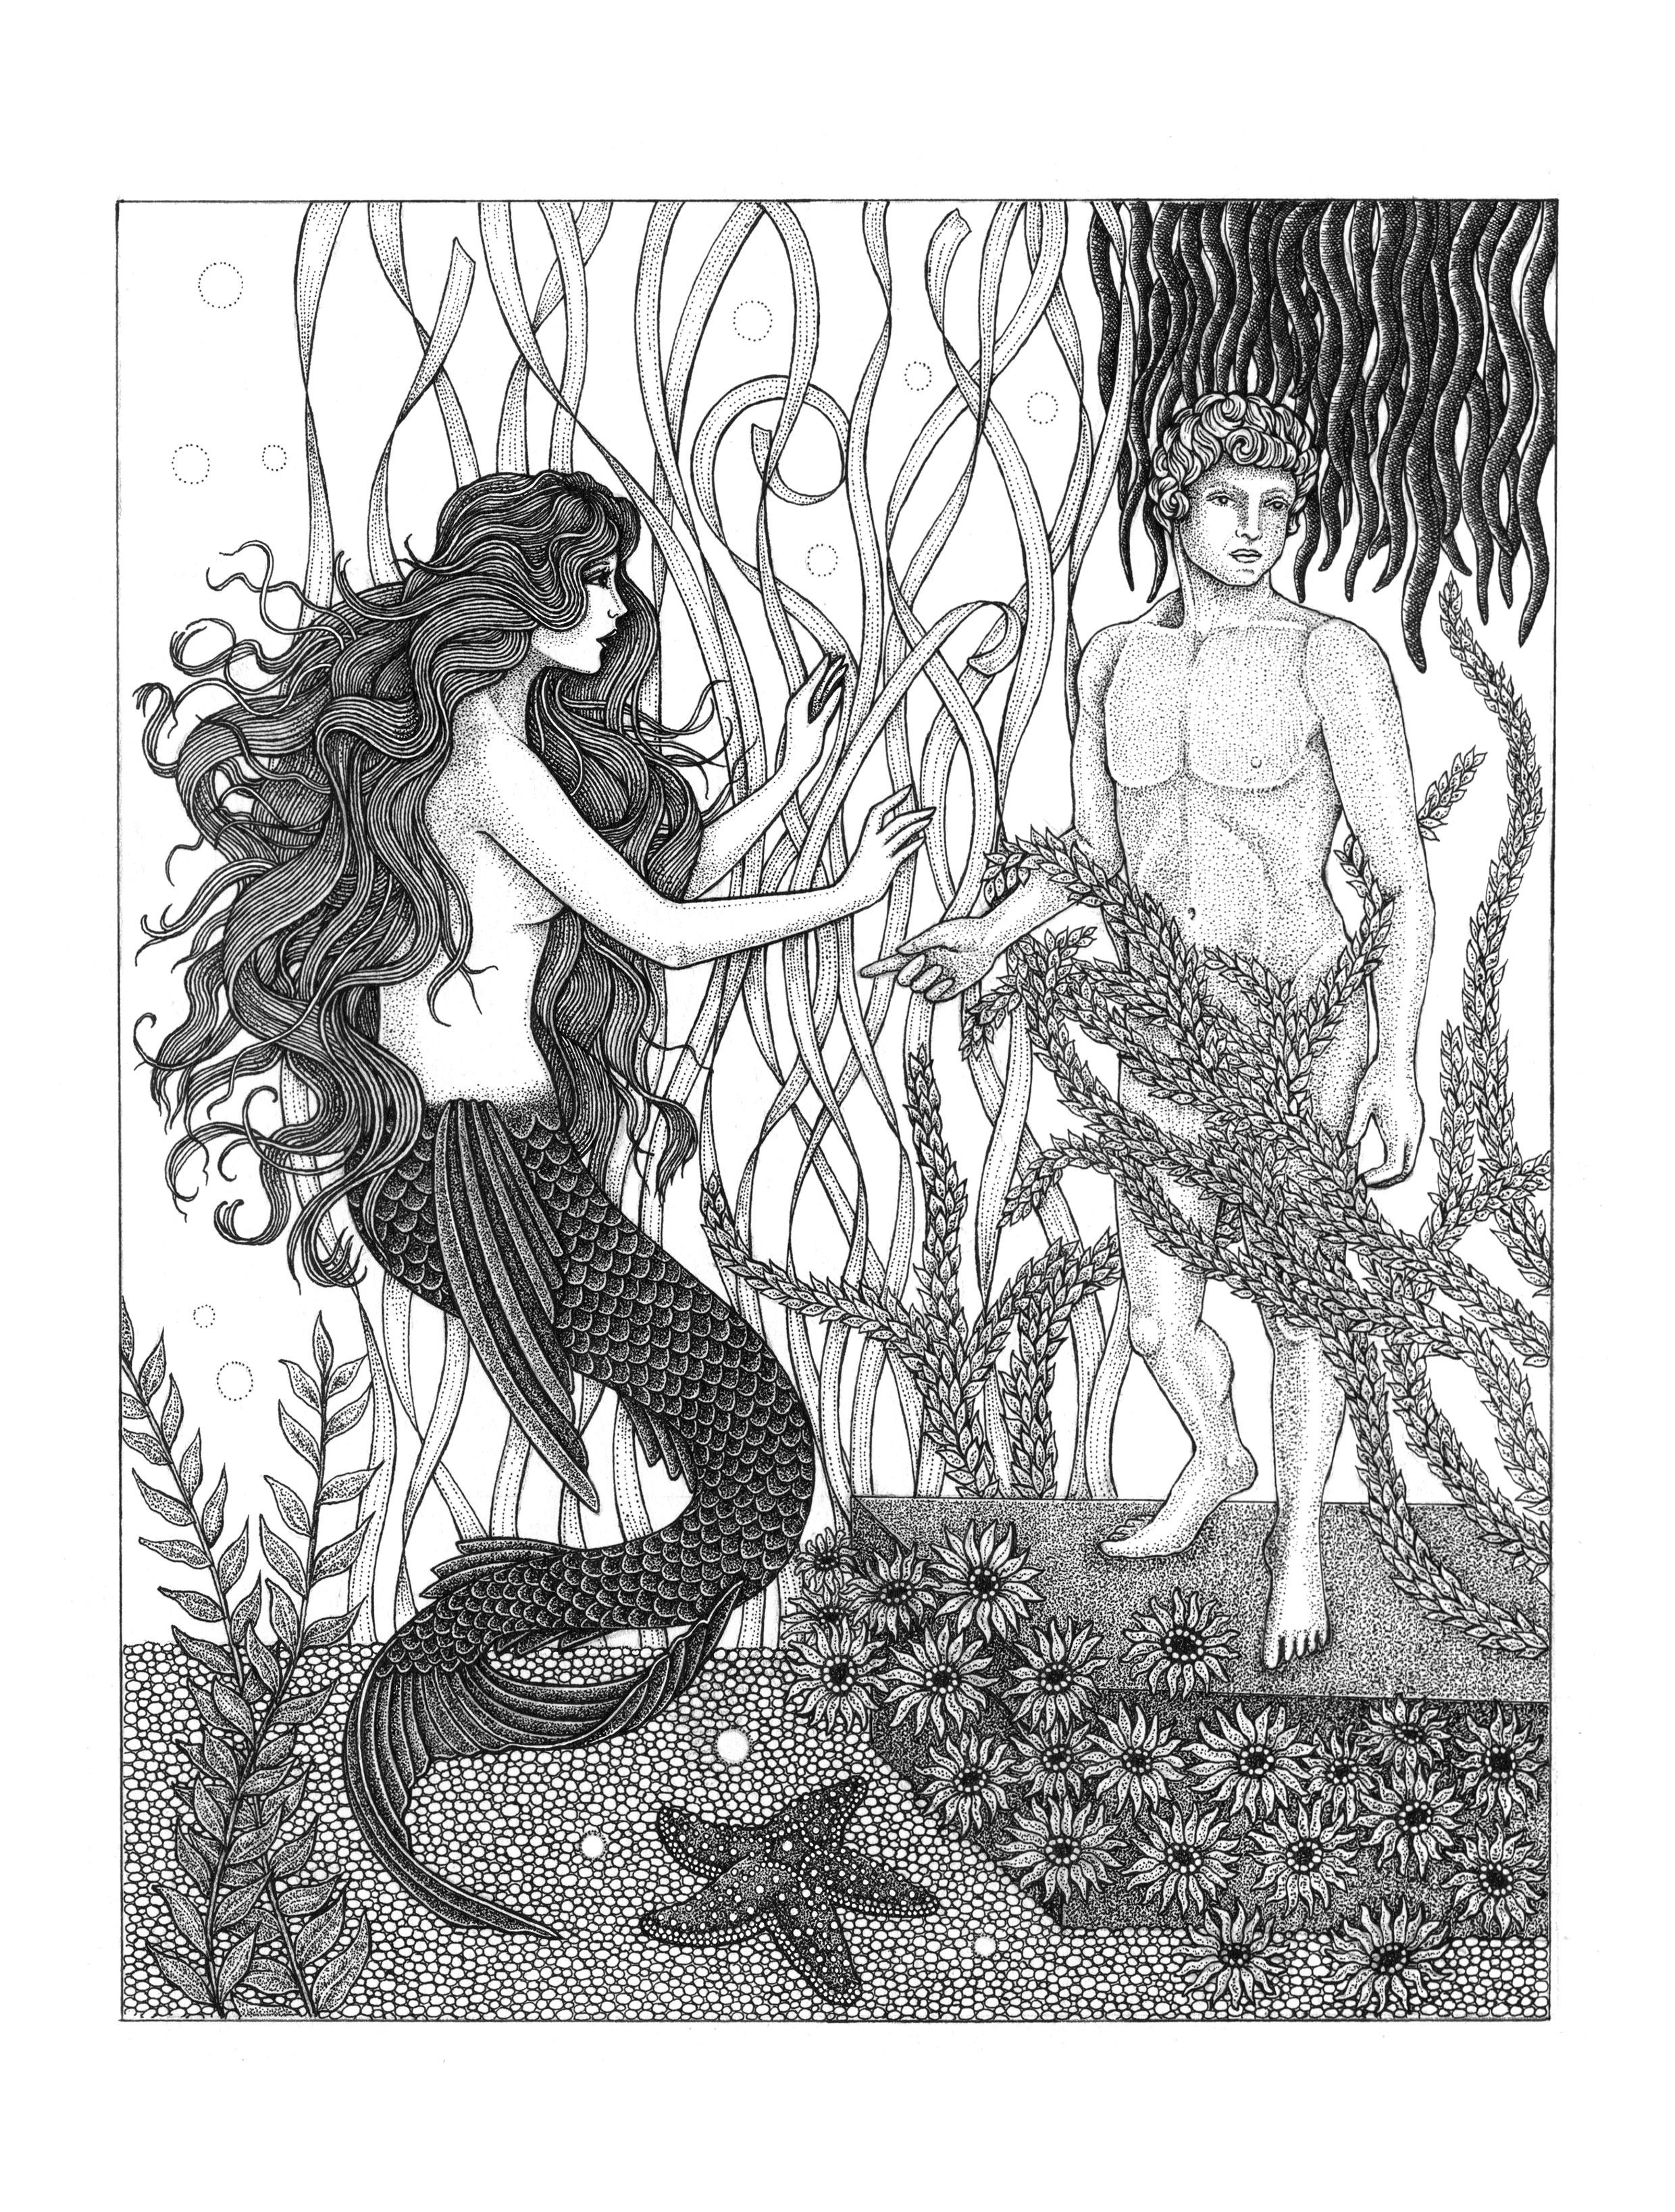 'The Little Mermaid'